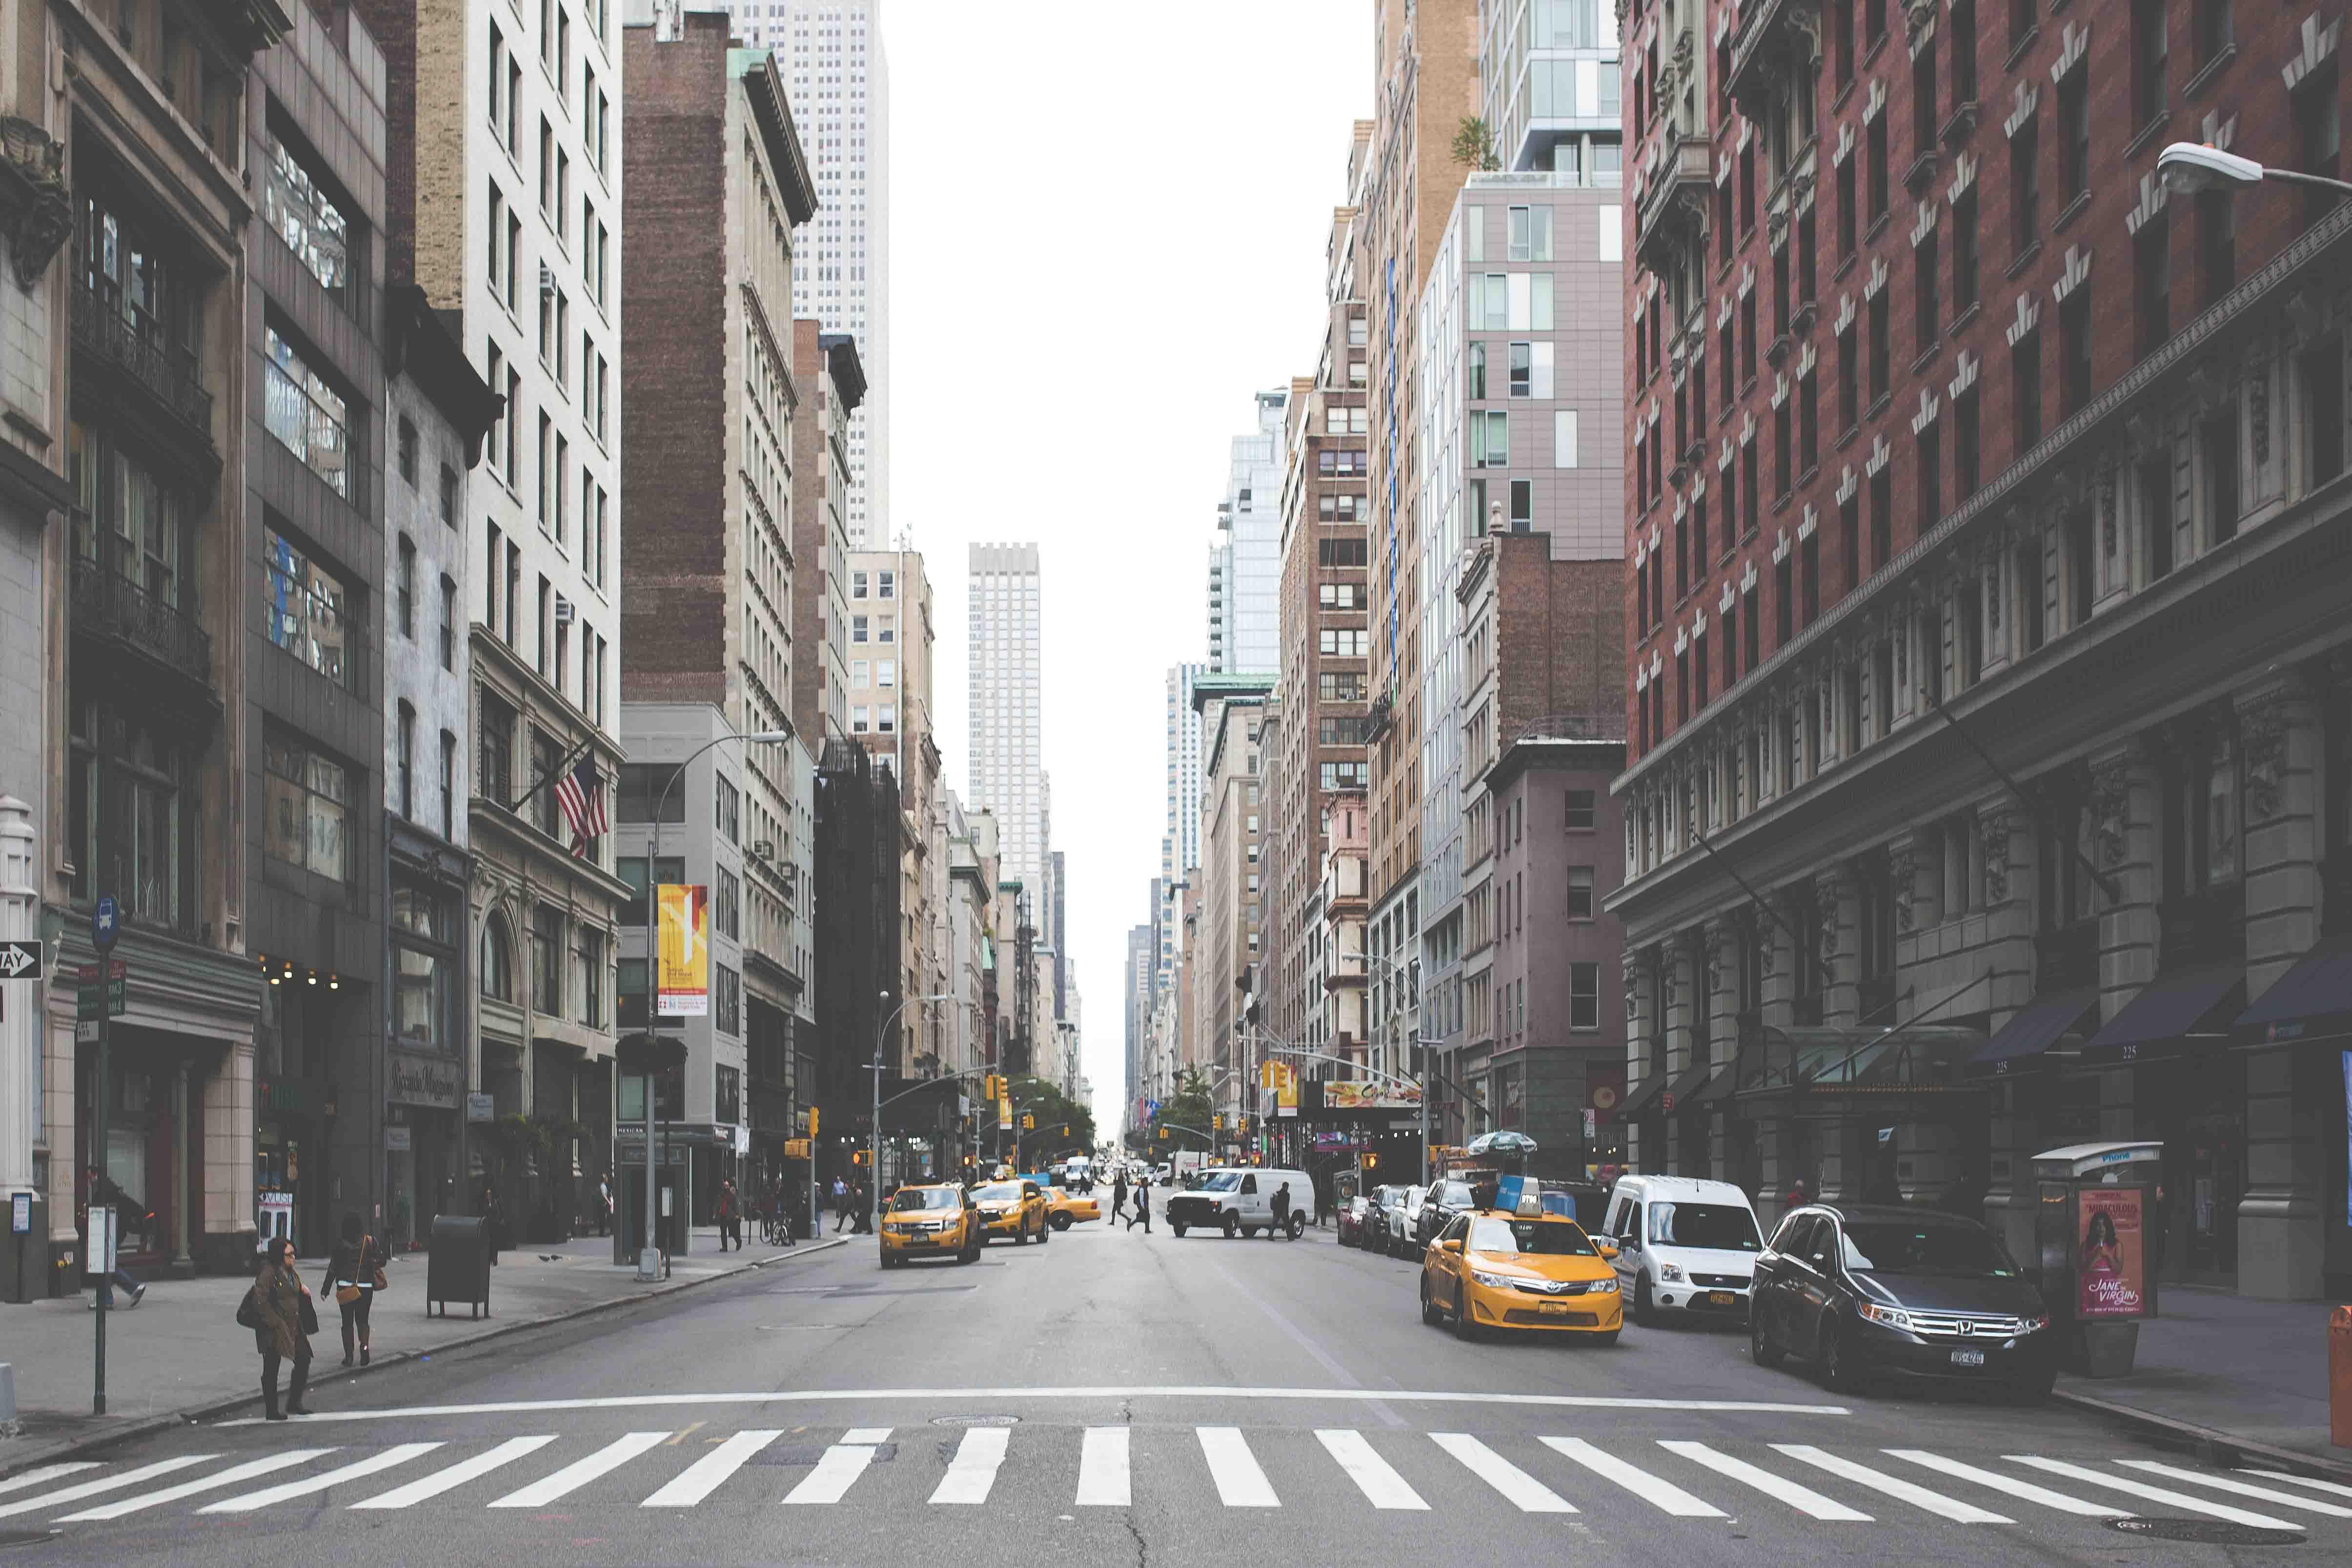 New york city wallpaper sf wallpaper new york city wallpaper pexels free stock photos voltagebd Gallery